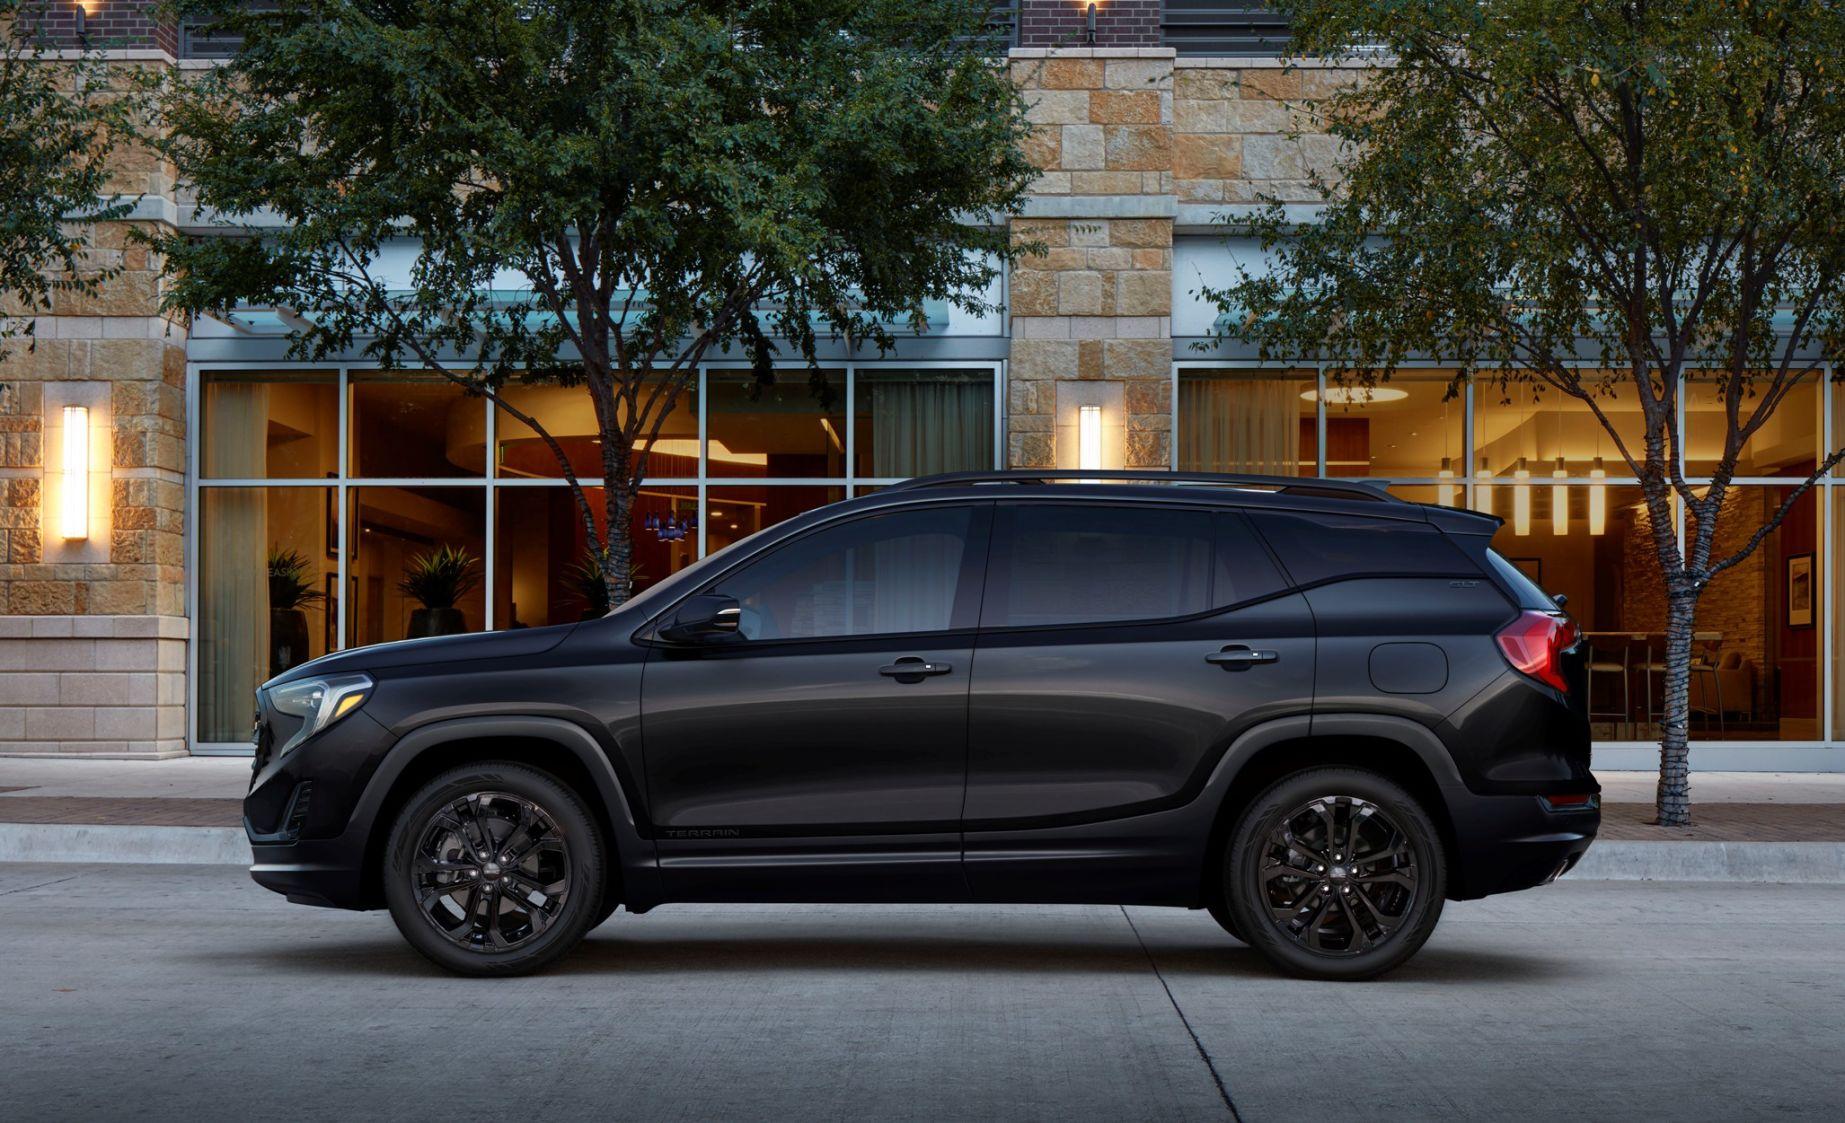 2019 Gmc Terrain Crossover Figures It Looks Good In Black Automotive Stltoday Com